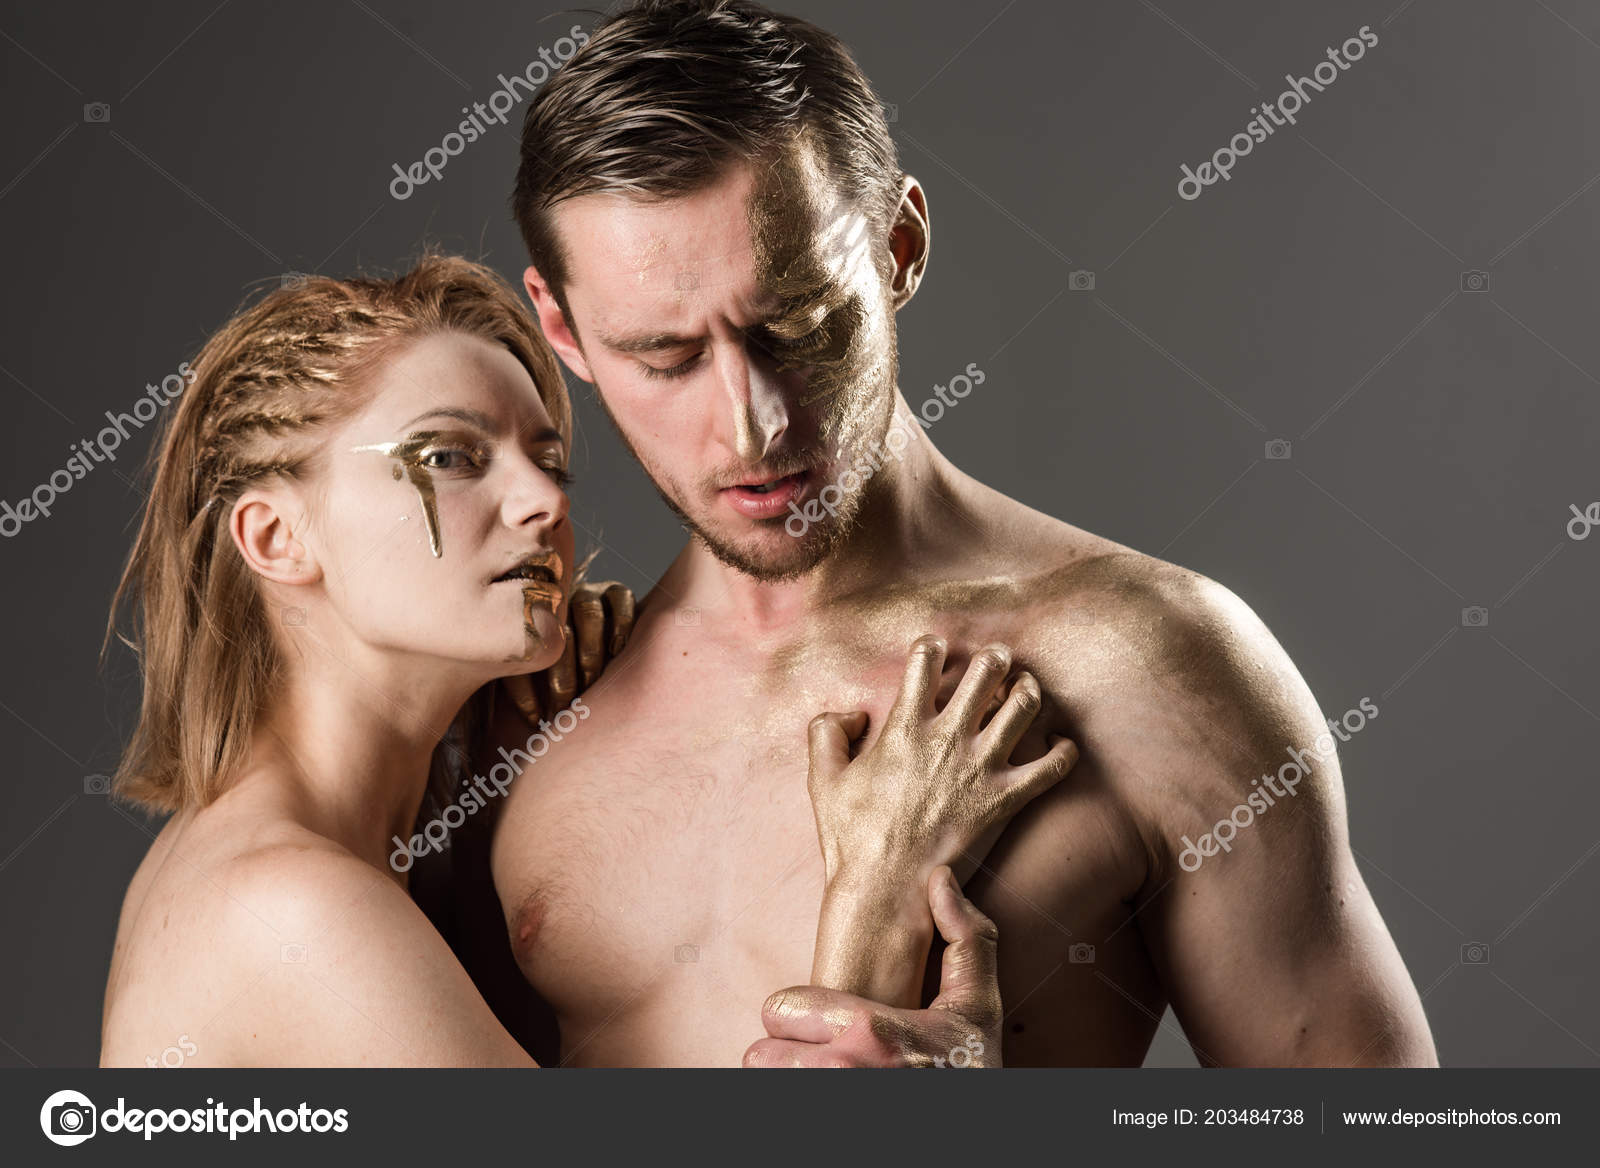 Art Fashion Portrait Of Sexy Couple Art Makeup And Body Paint Of Man And Woman Stock Photo C Tverdohlib Com 203484738